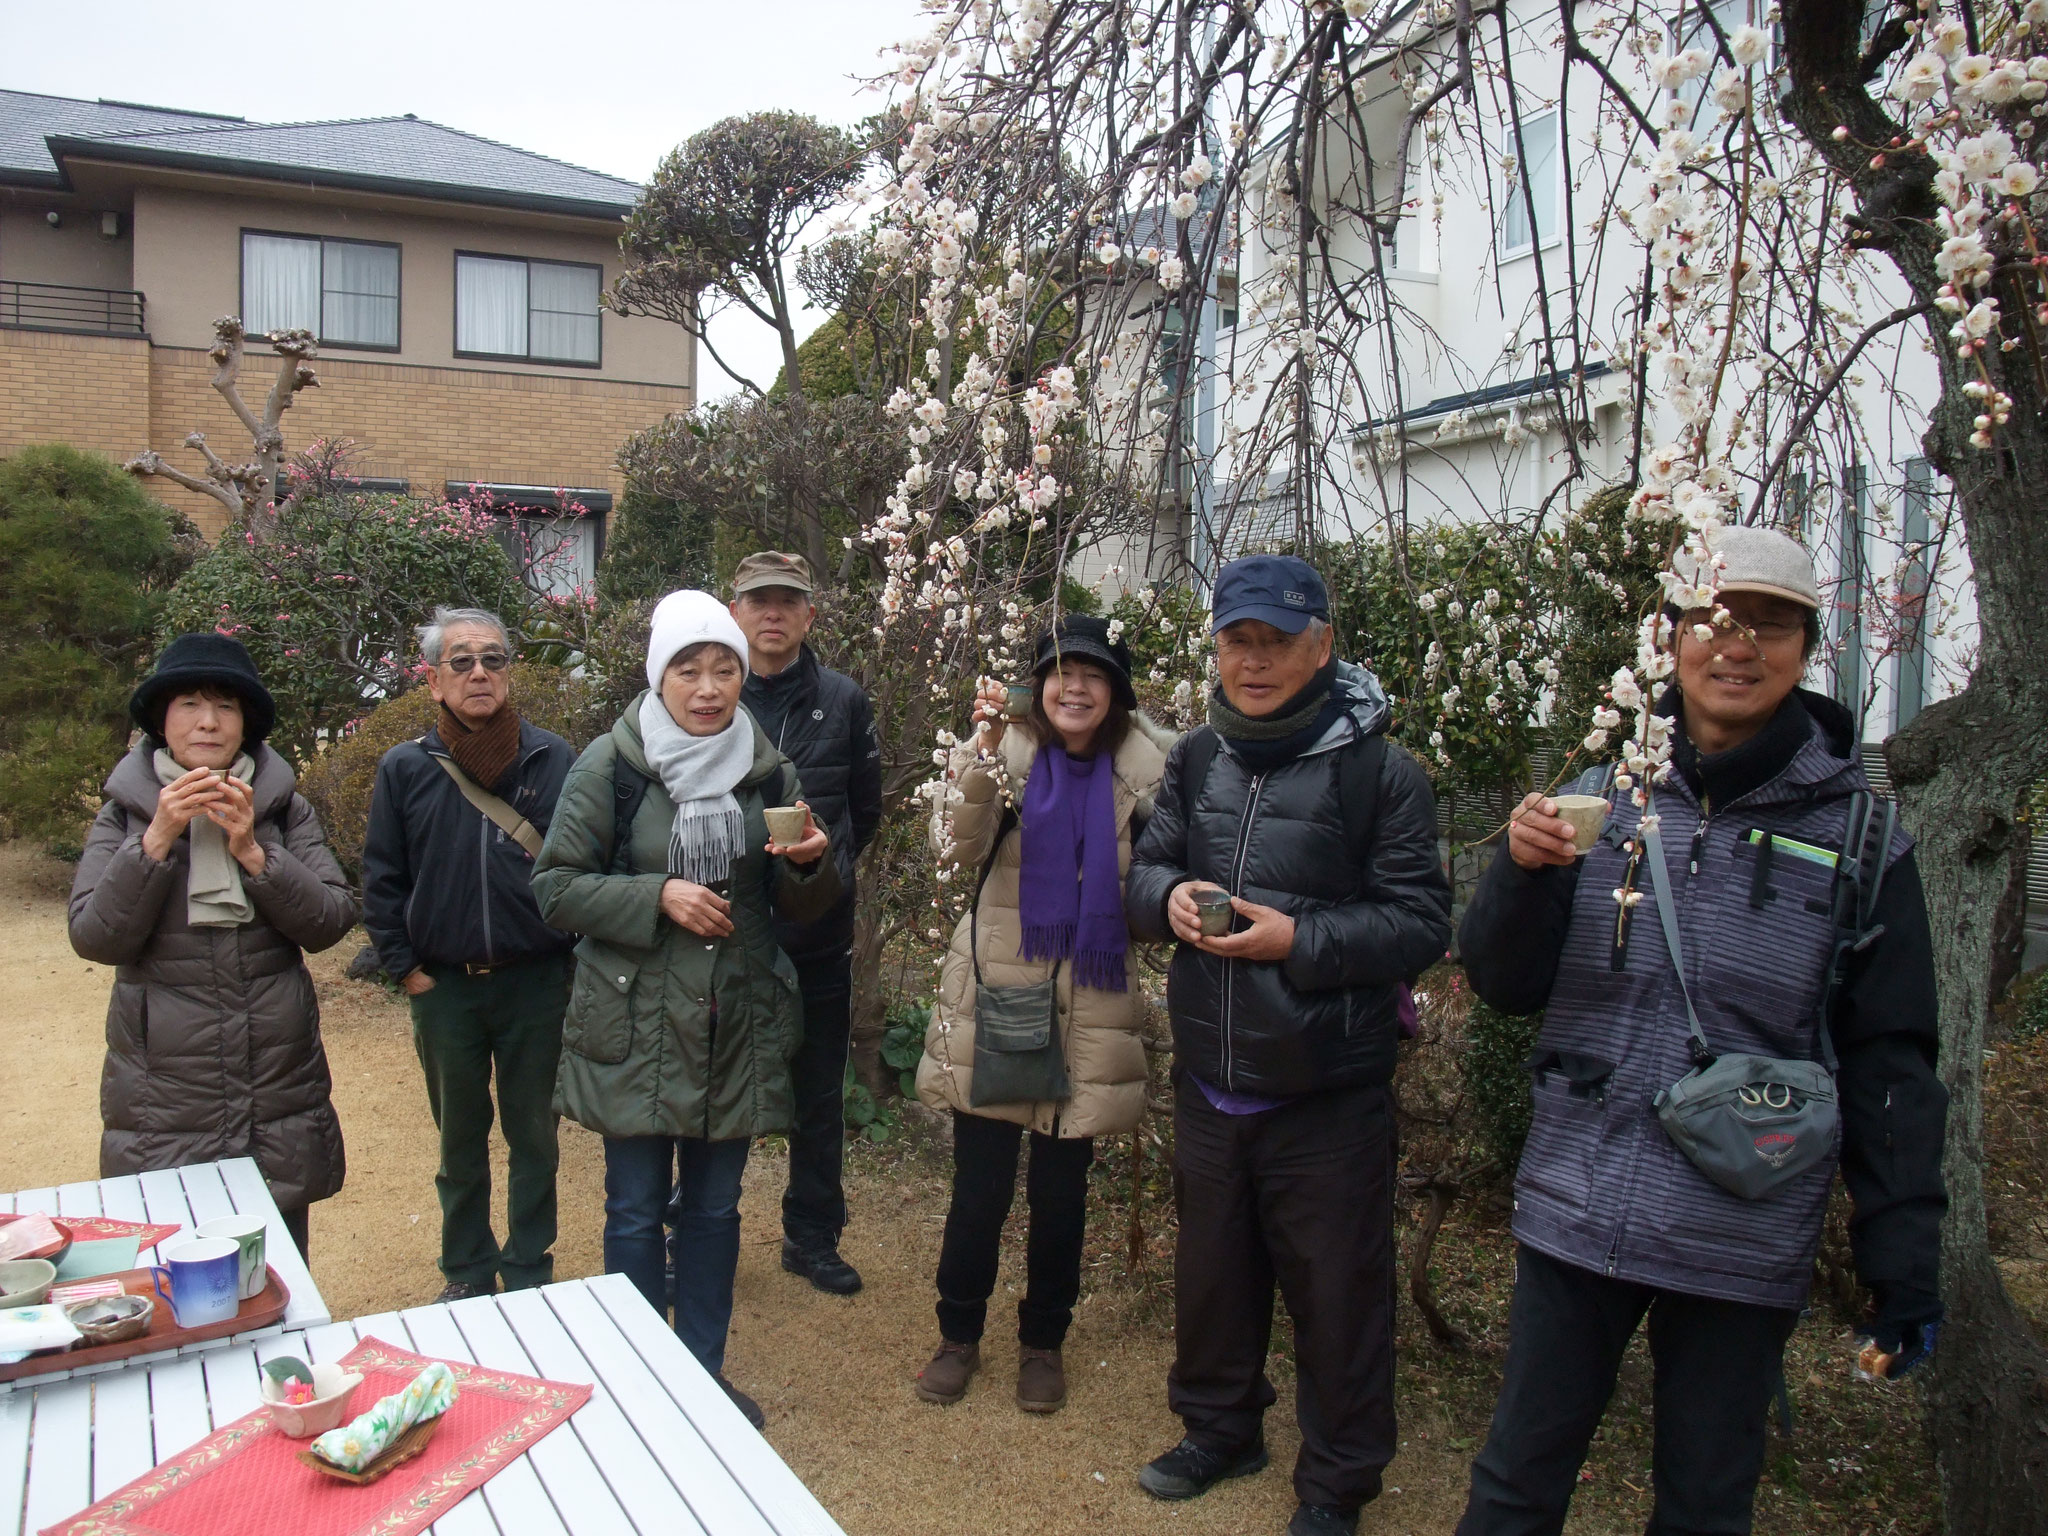 N氏邸にお邪魔して枝垂れ梅の庭で暖かい甘酒を頂く